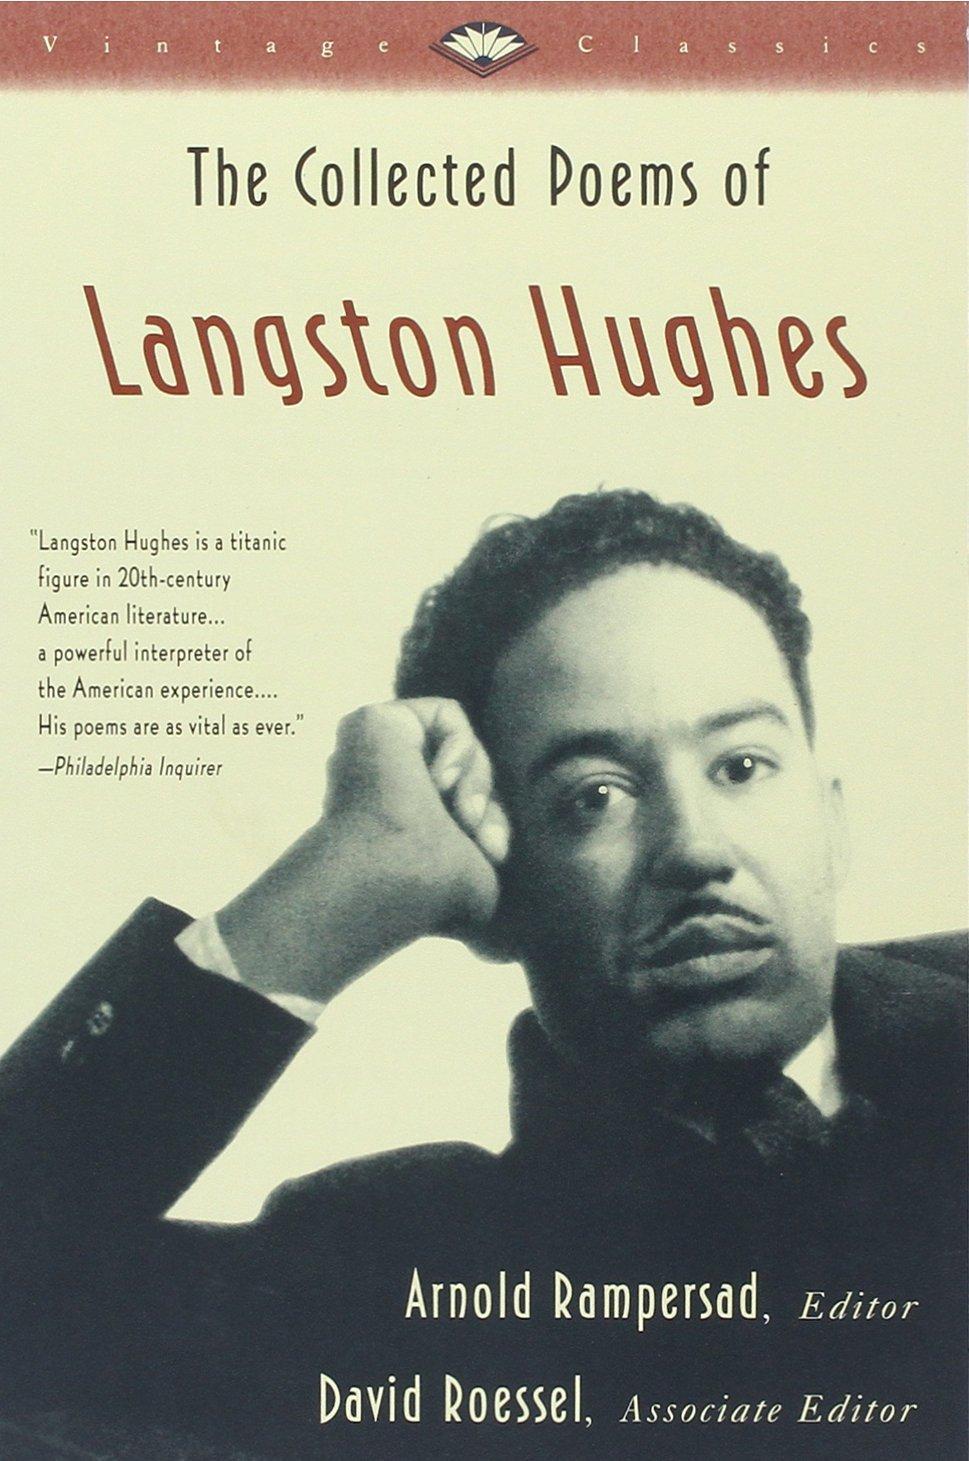 Langston Hughes?